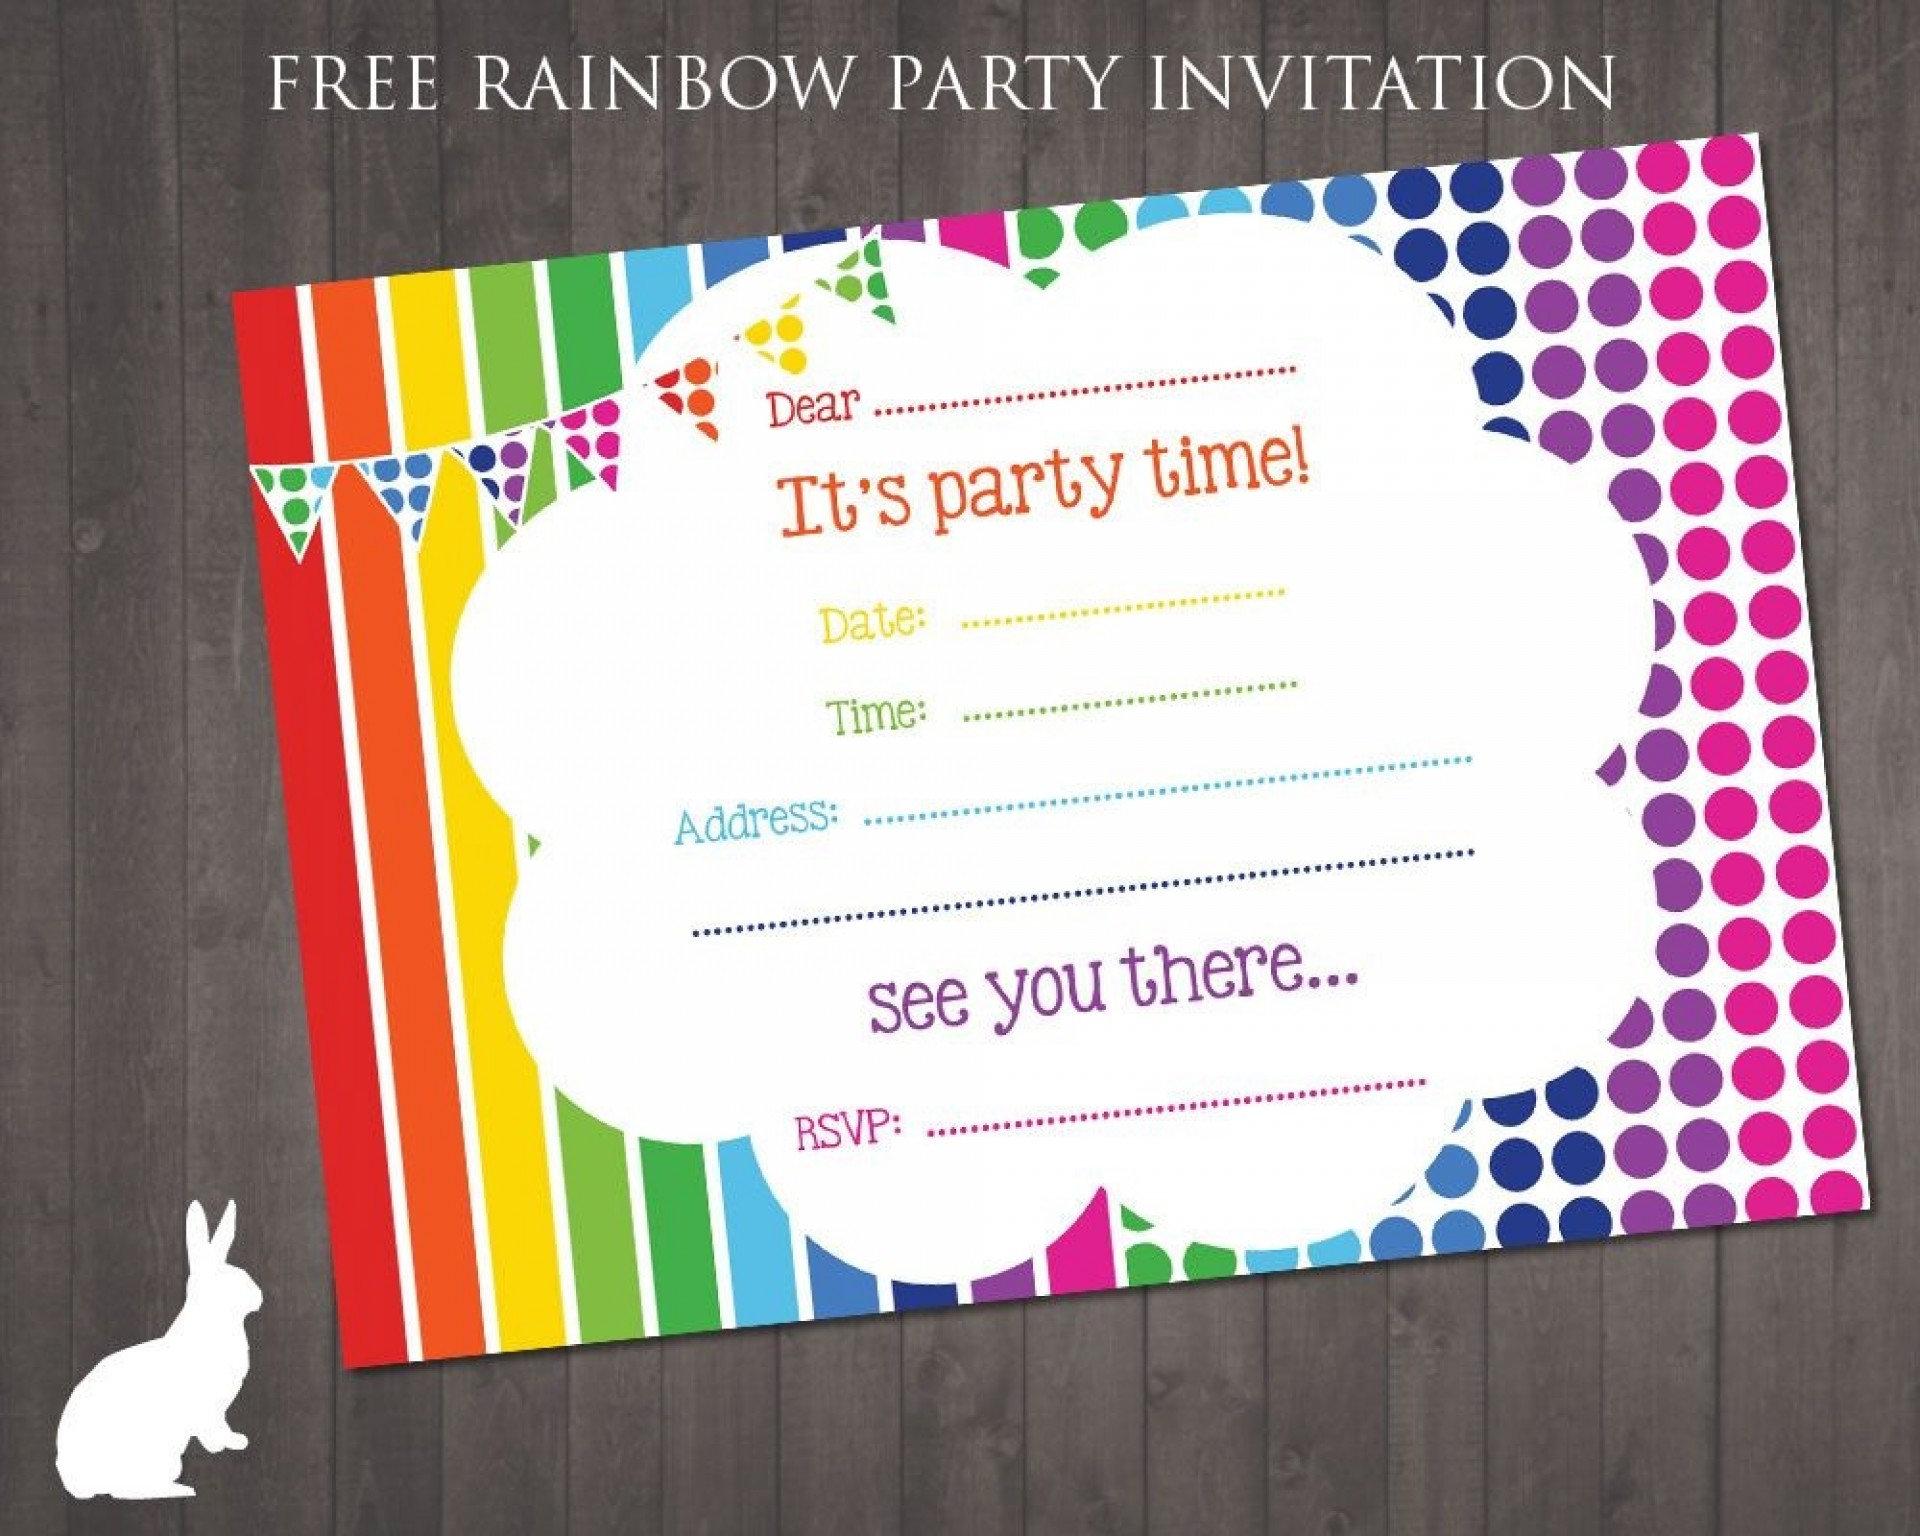 000 Phenomenal Free Printable Party Invitation Template High Resolution  Templates Beach Spa Tea1920